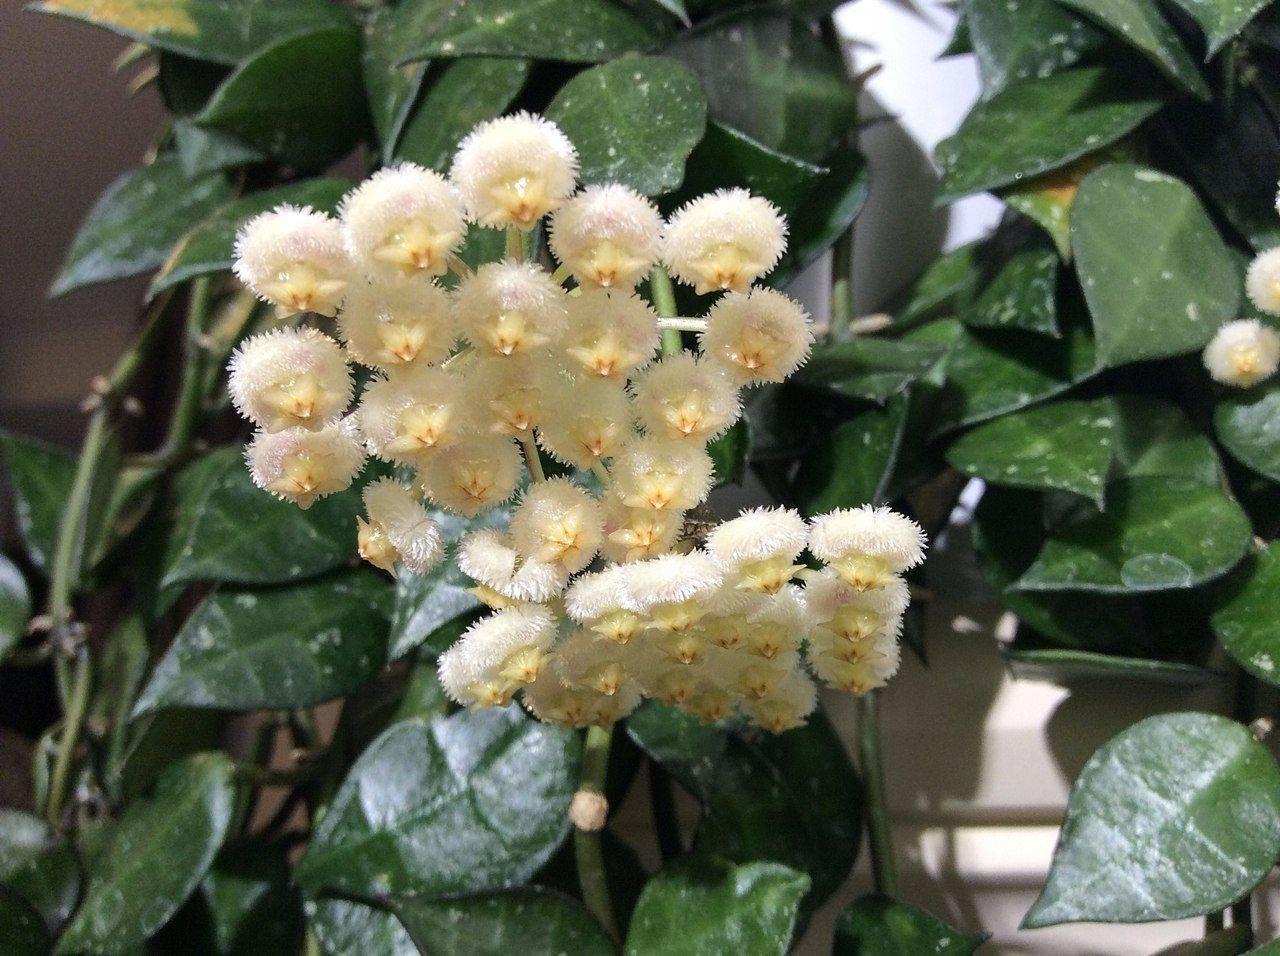 Уход в домашних условиях за растением – хойя (фото комнатного цветка)